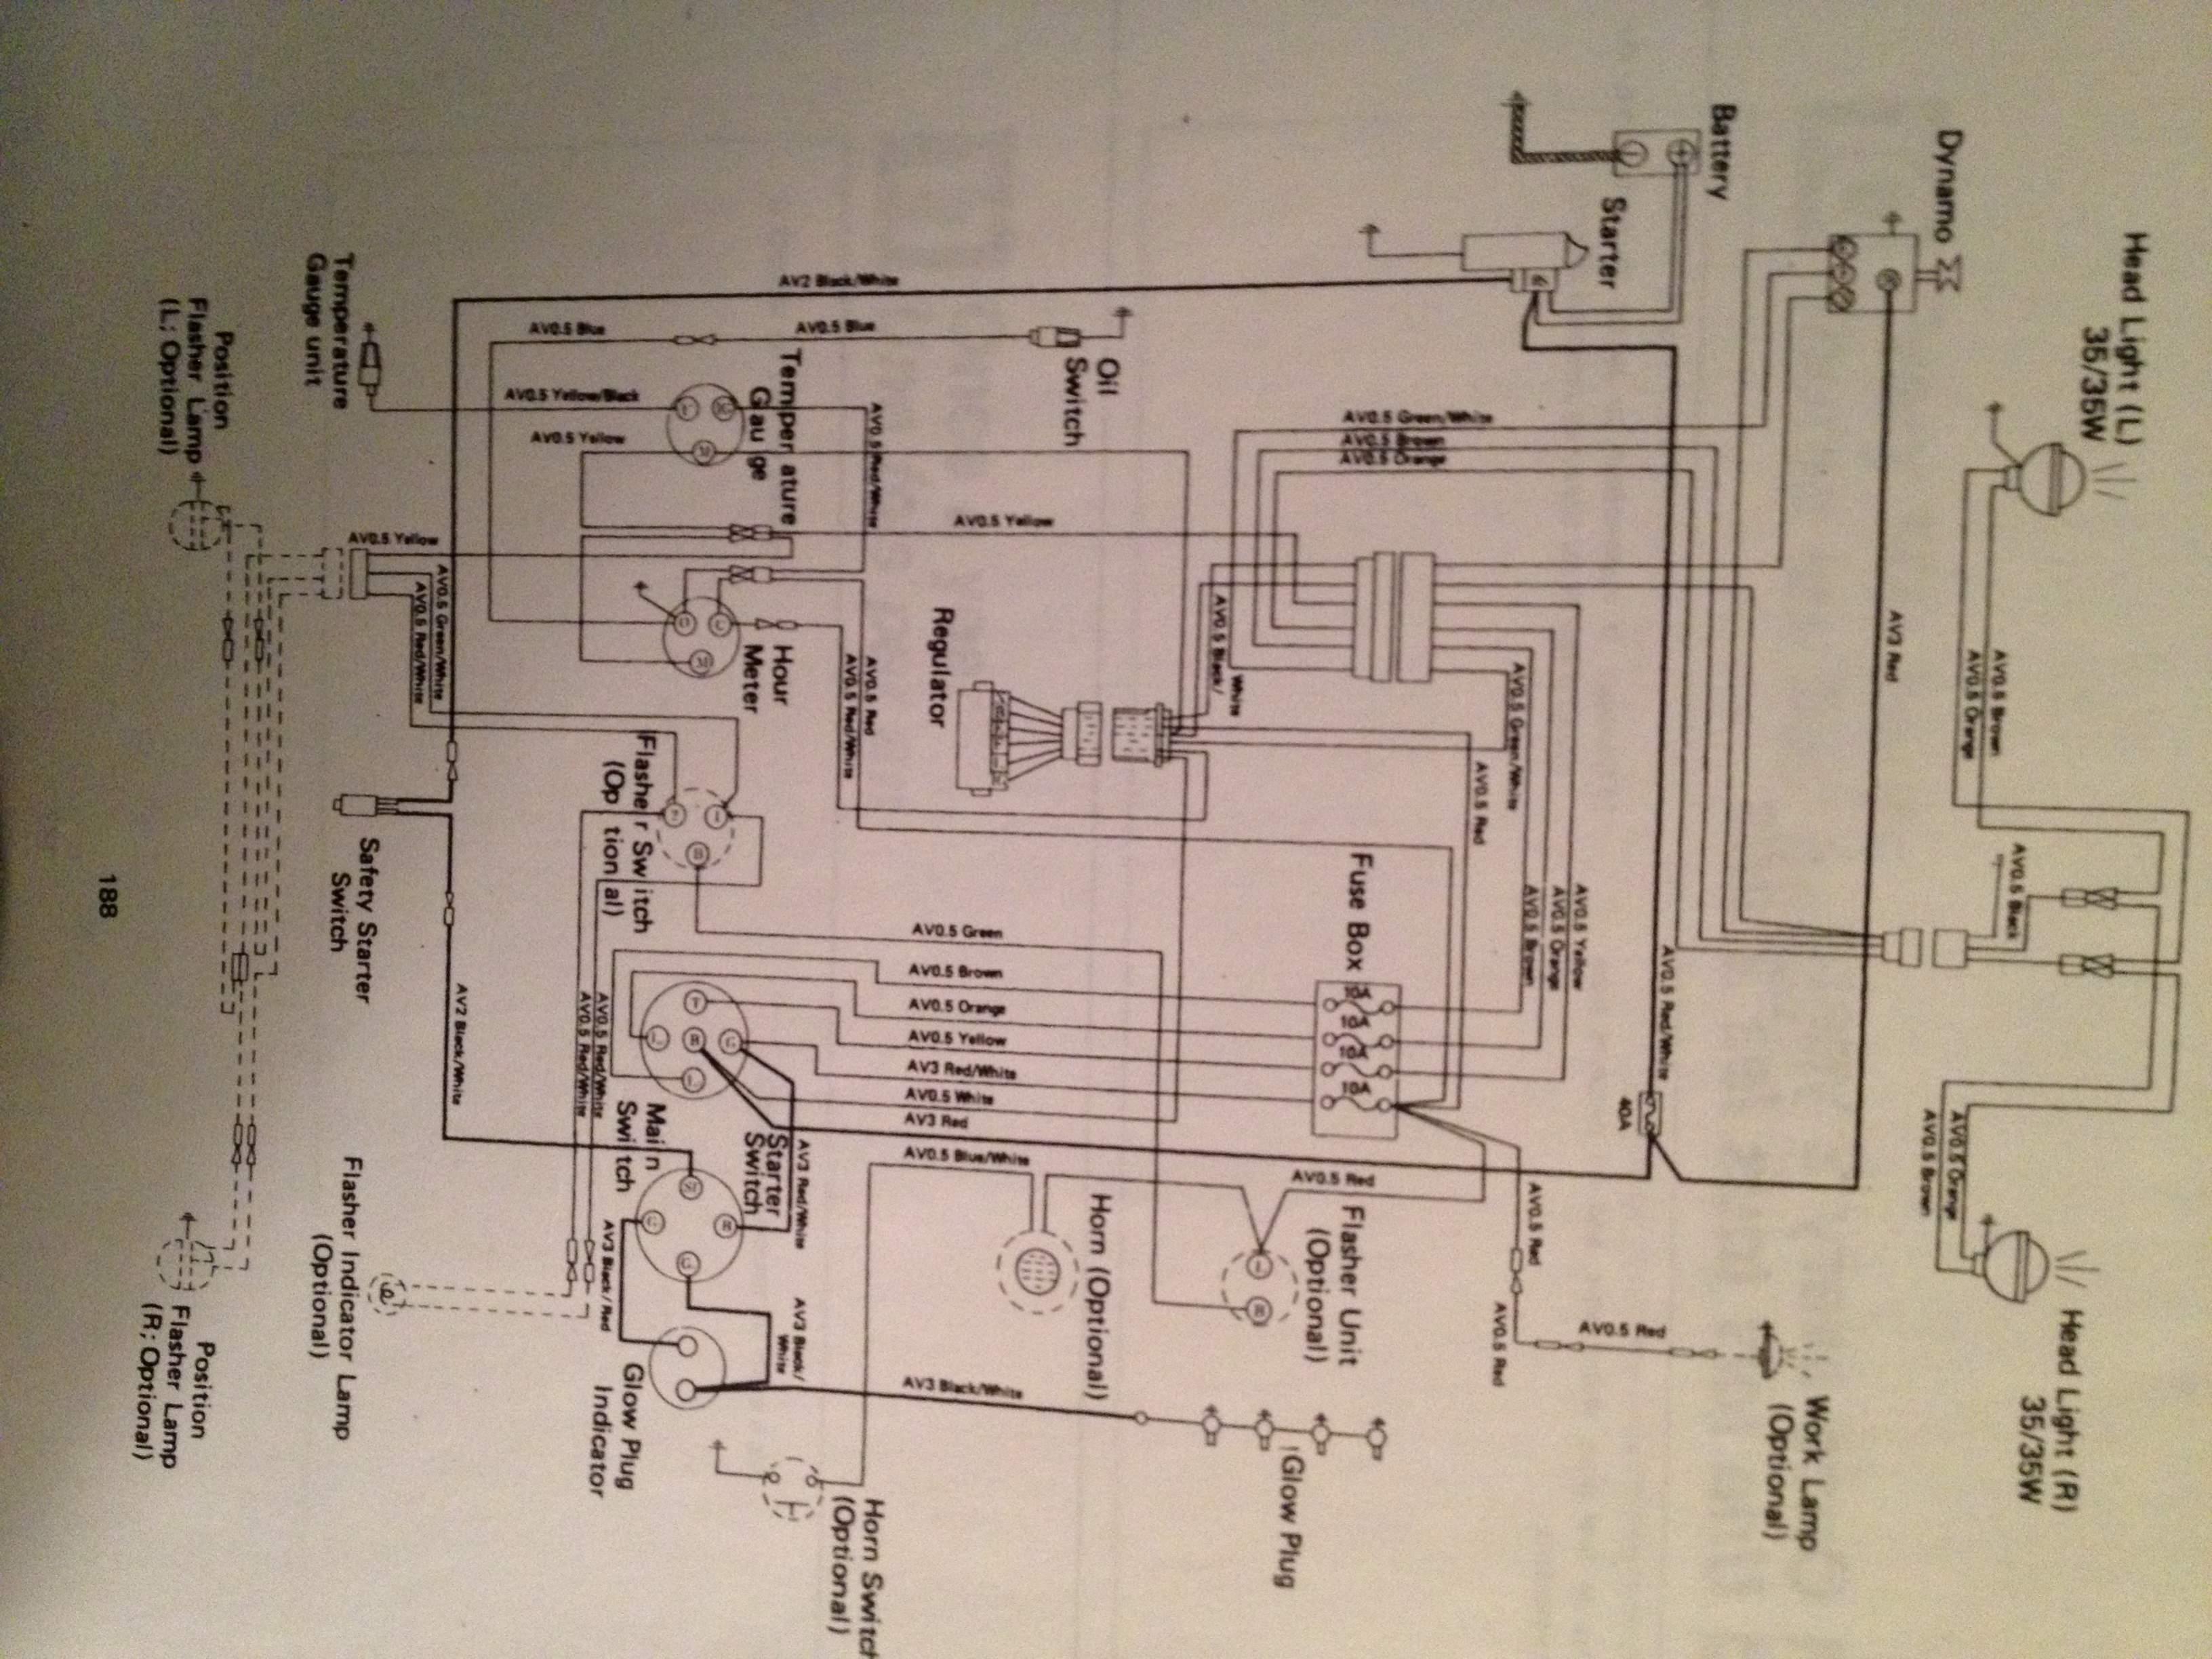 Marvelous Kubota B7800 Wiring Diagram Better Wiring Diagram Online Wiring Cloud Apomsimijknierdonabenoleattemohammedshrineorg